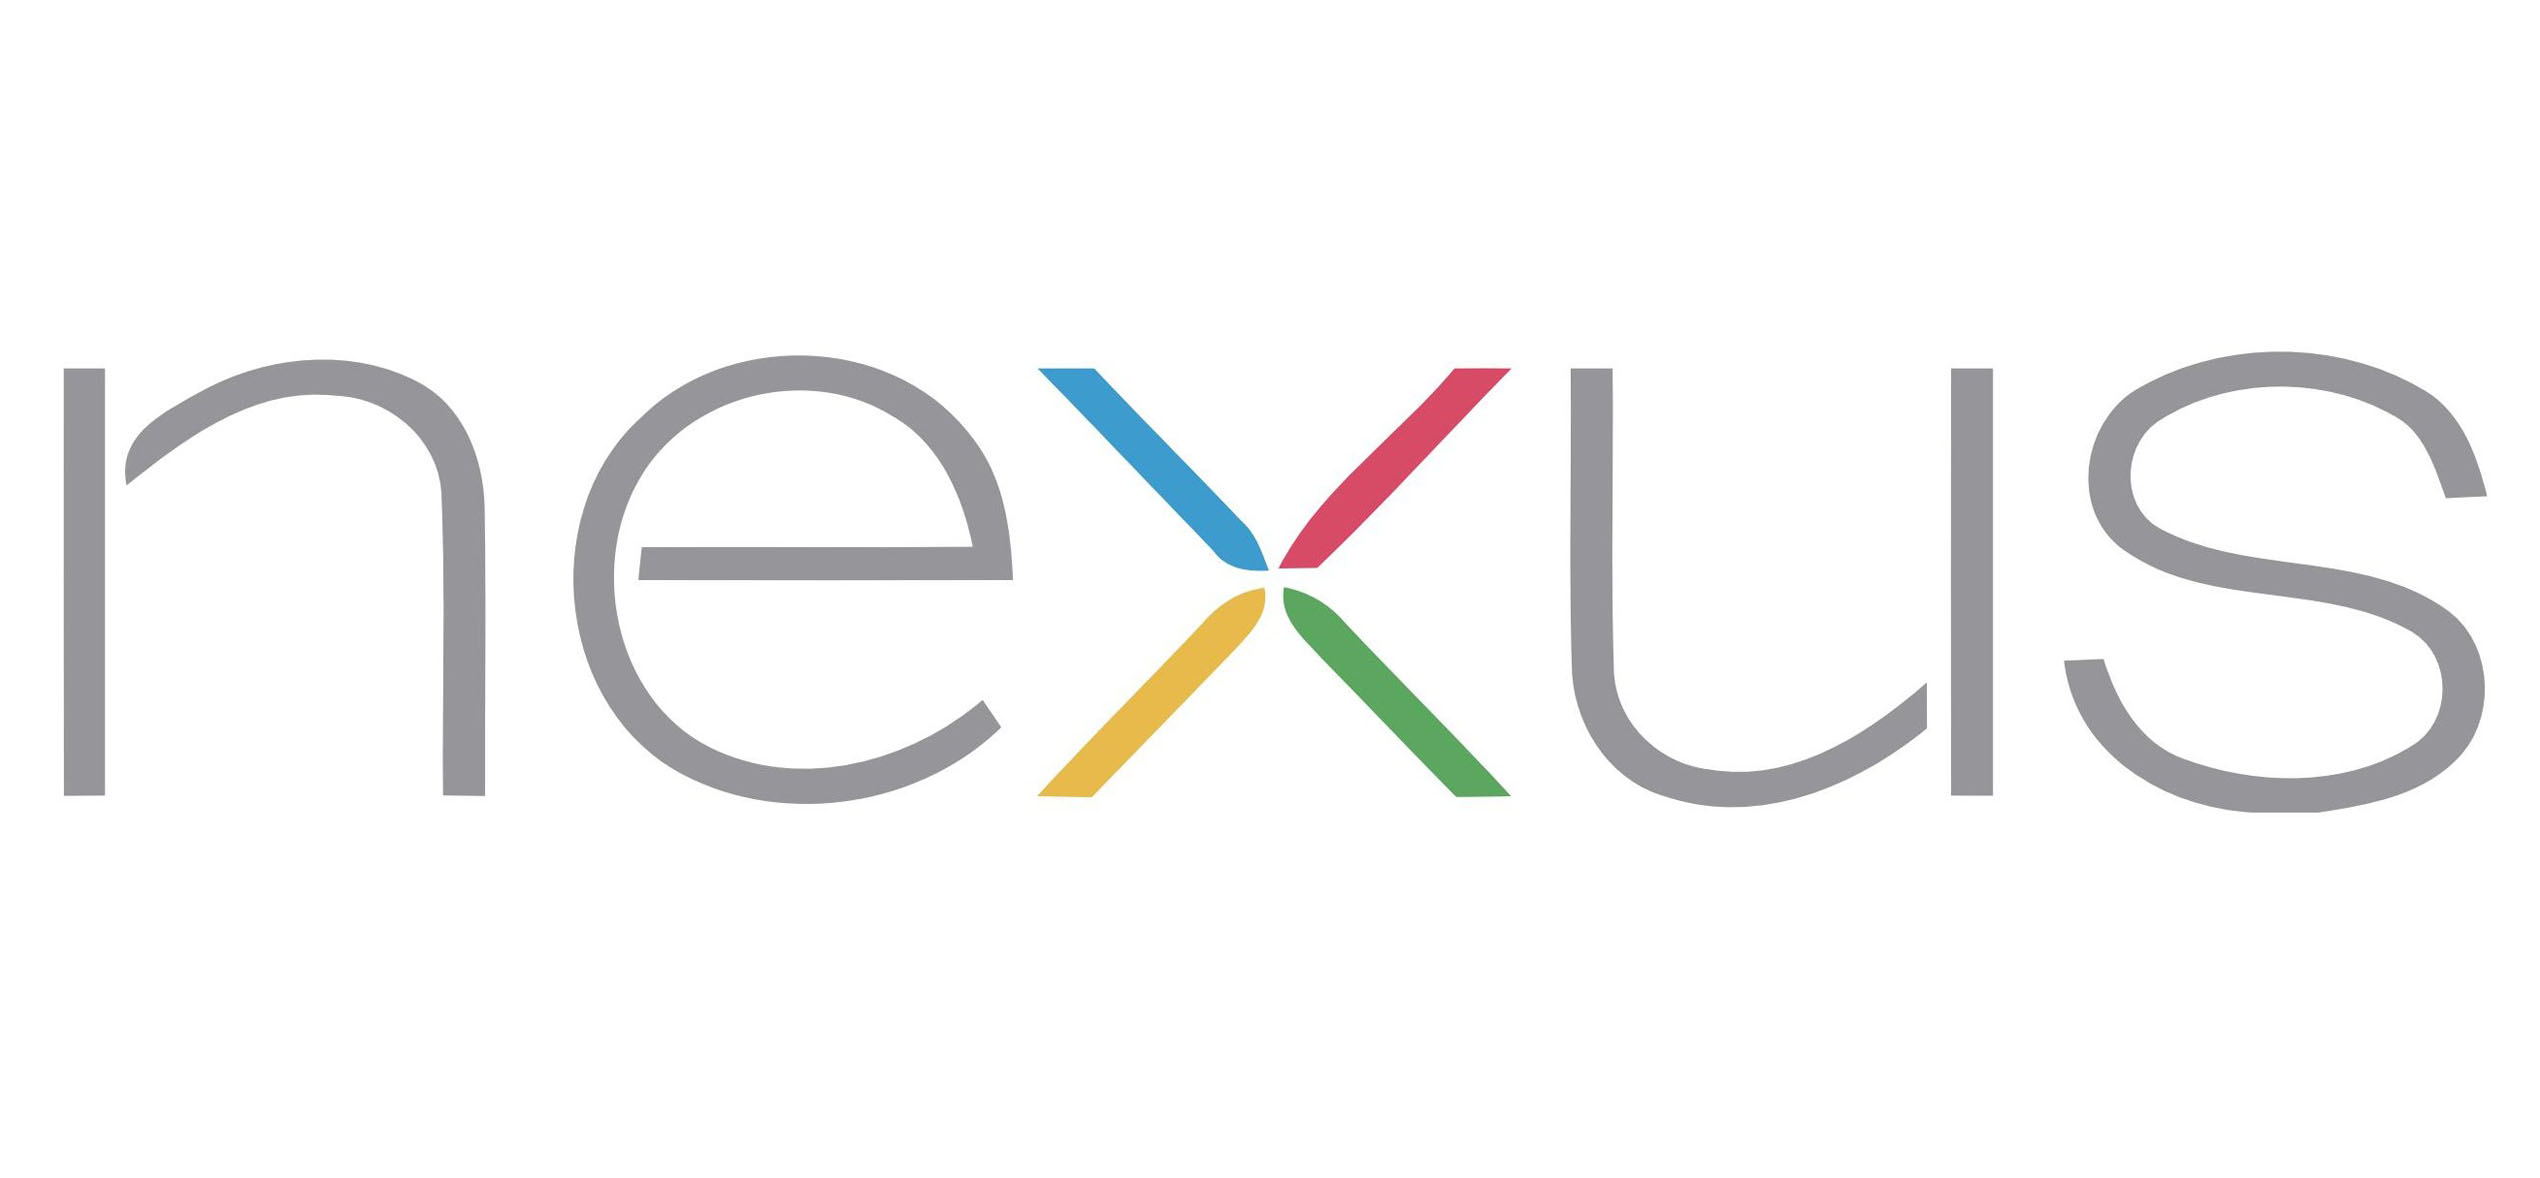 Huawei To Do the Next Nexus Device?